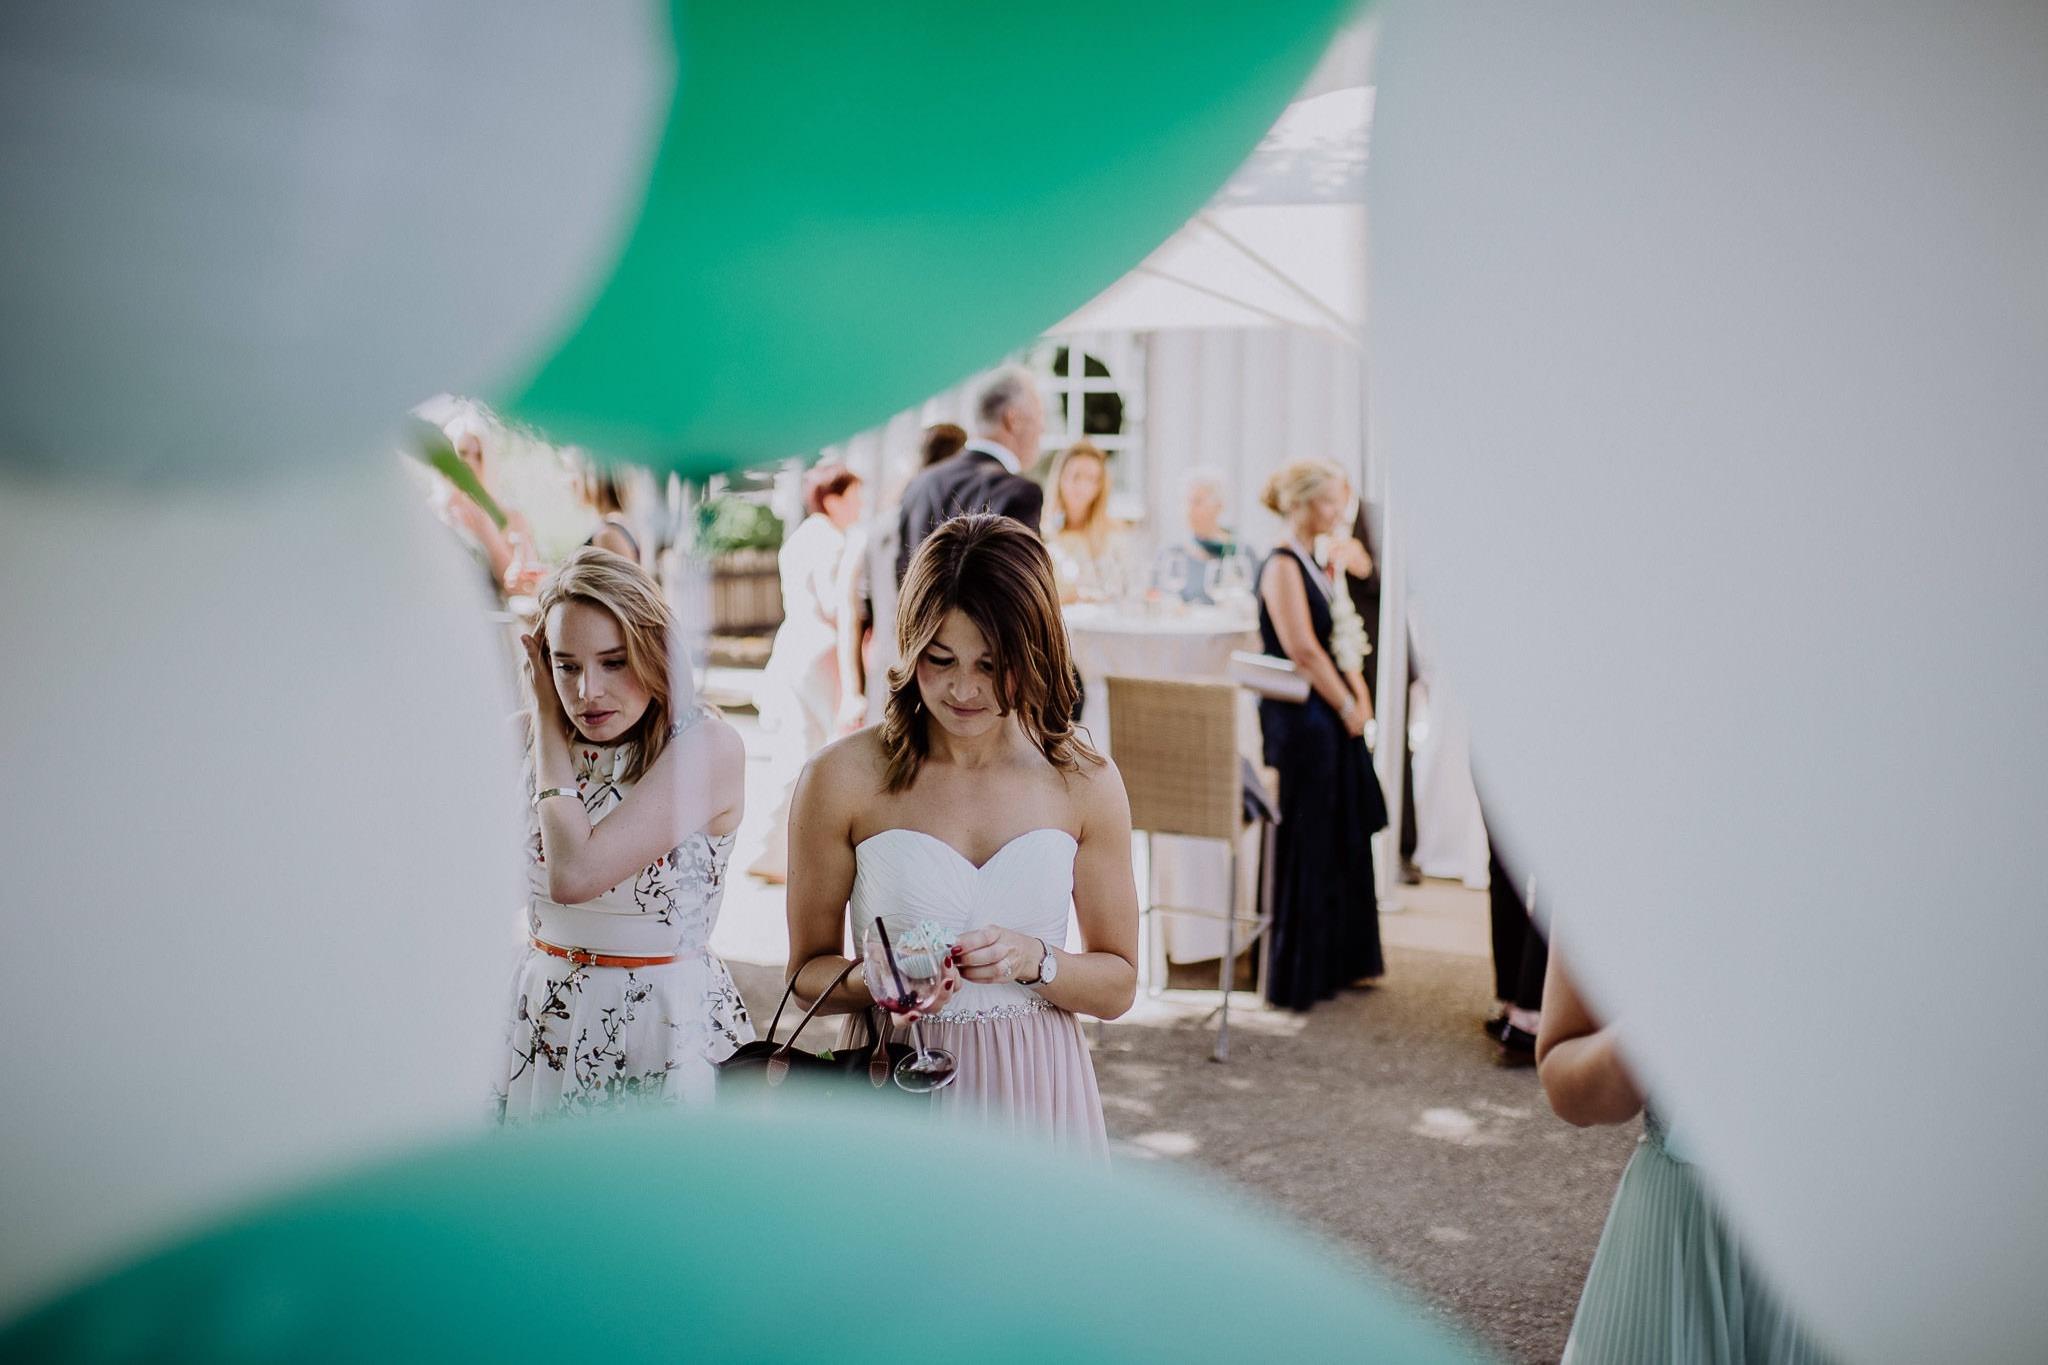 wedding photographer hamilton new zealand 1032 1